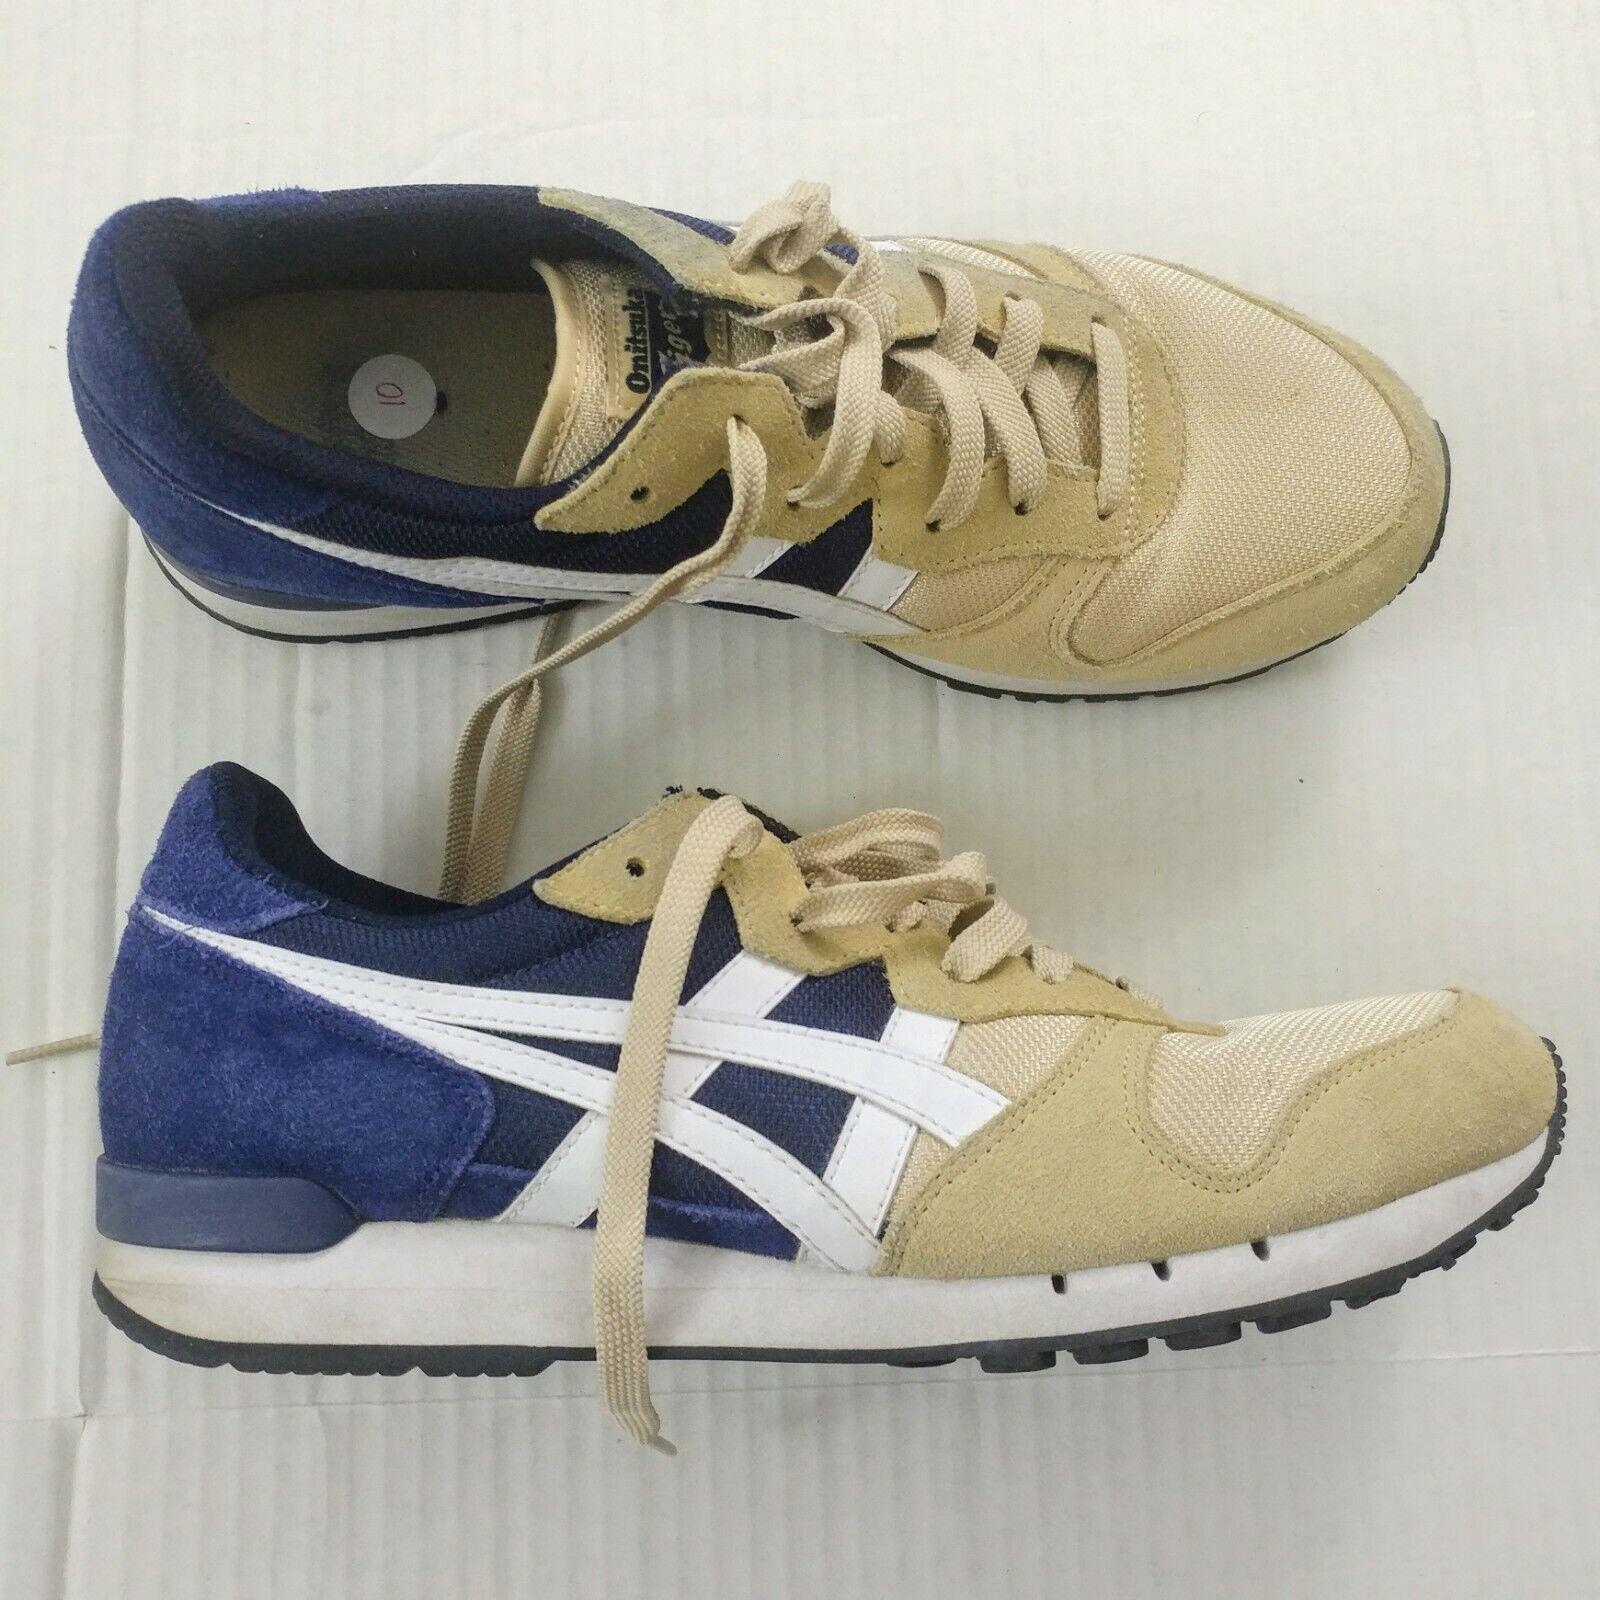 Asics Onitsuka Tiger Mens shoes Size 10